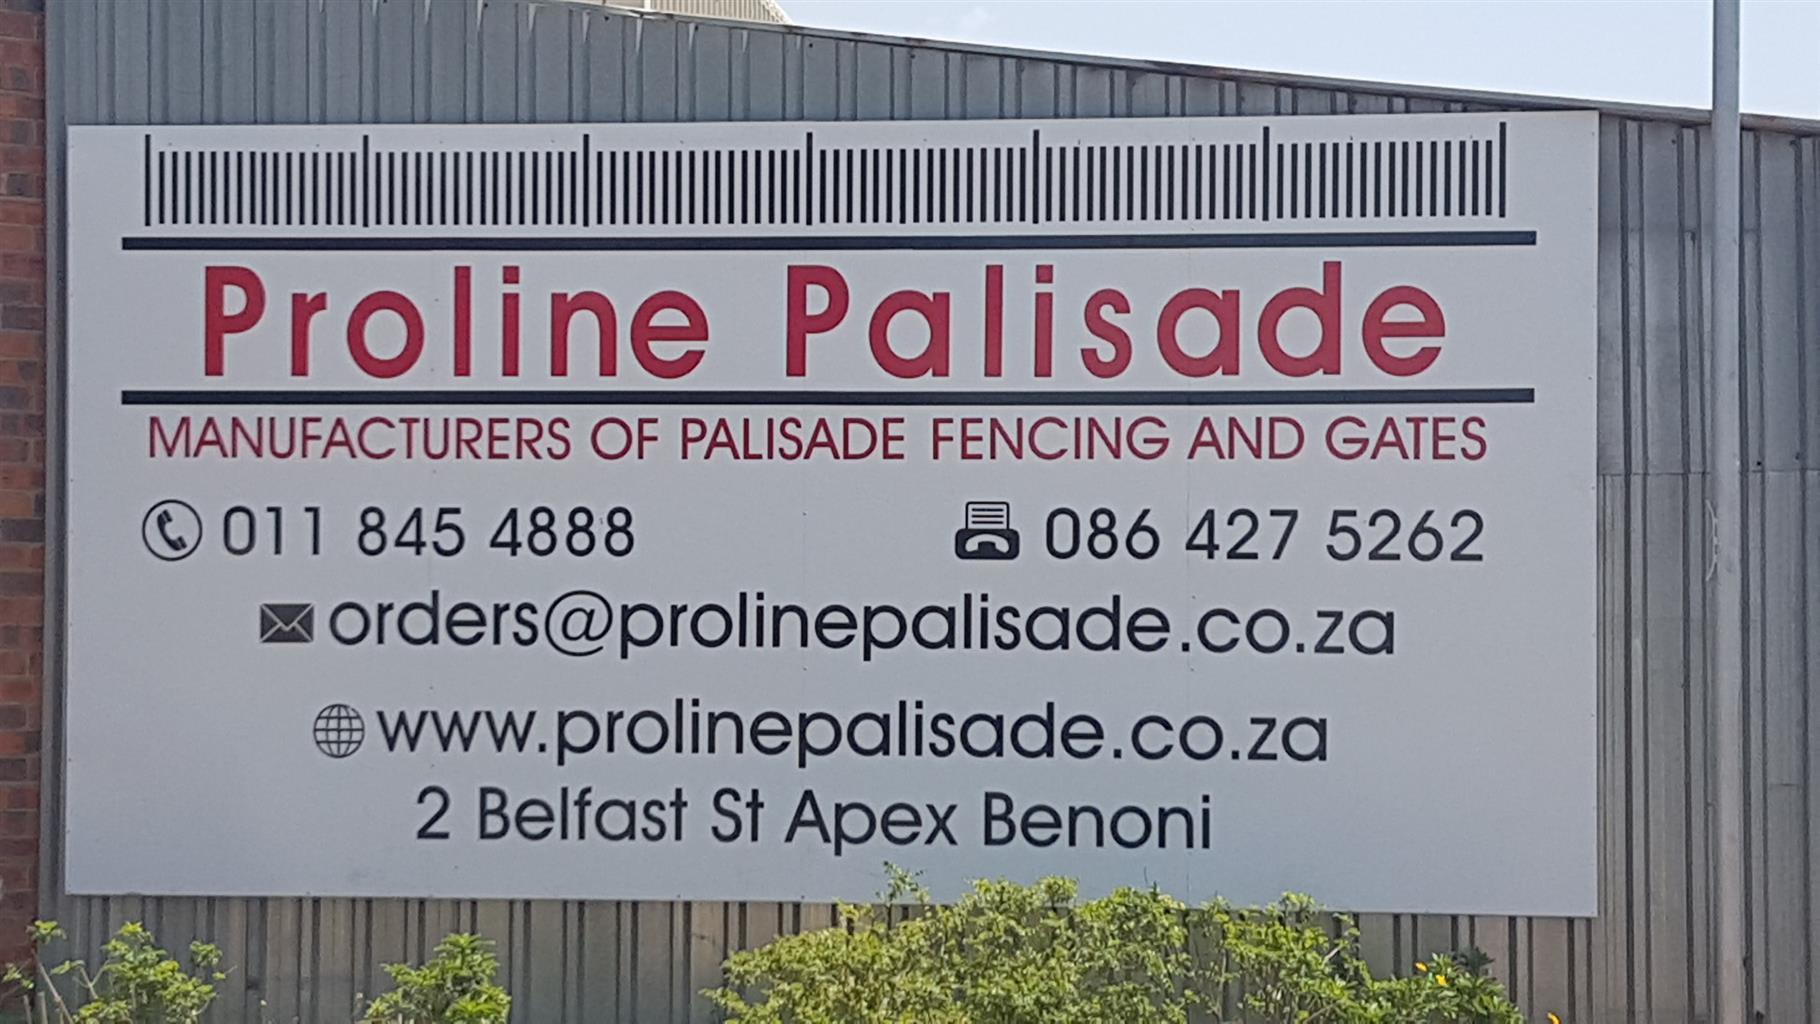 PALISADE FENCING - www.prolinepalisade.co.za